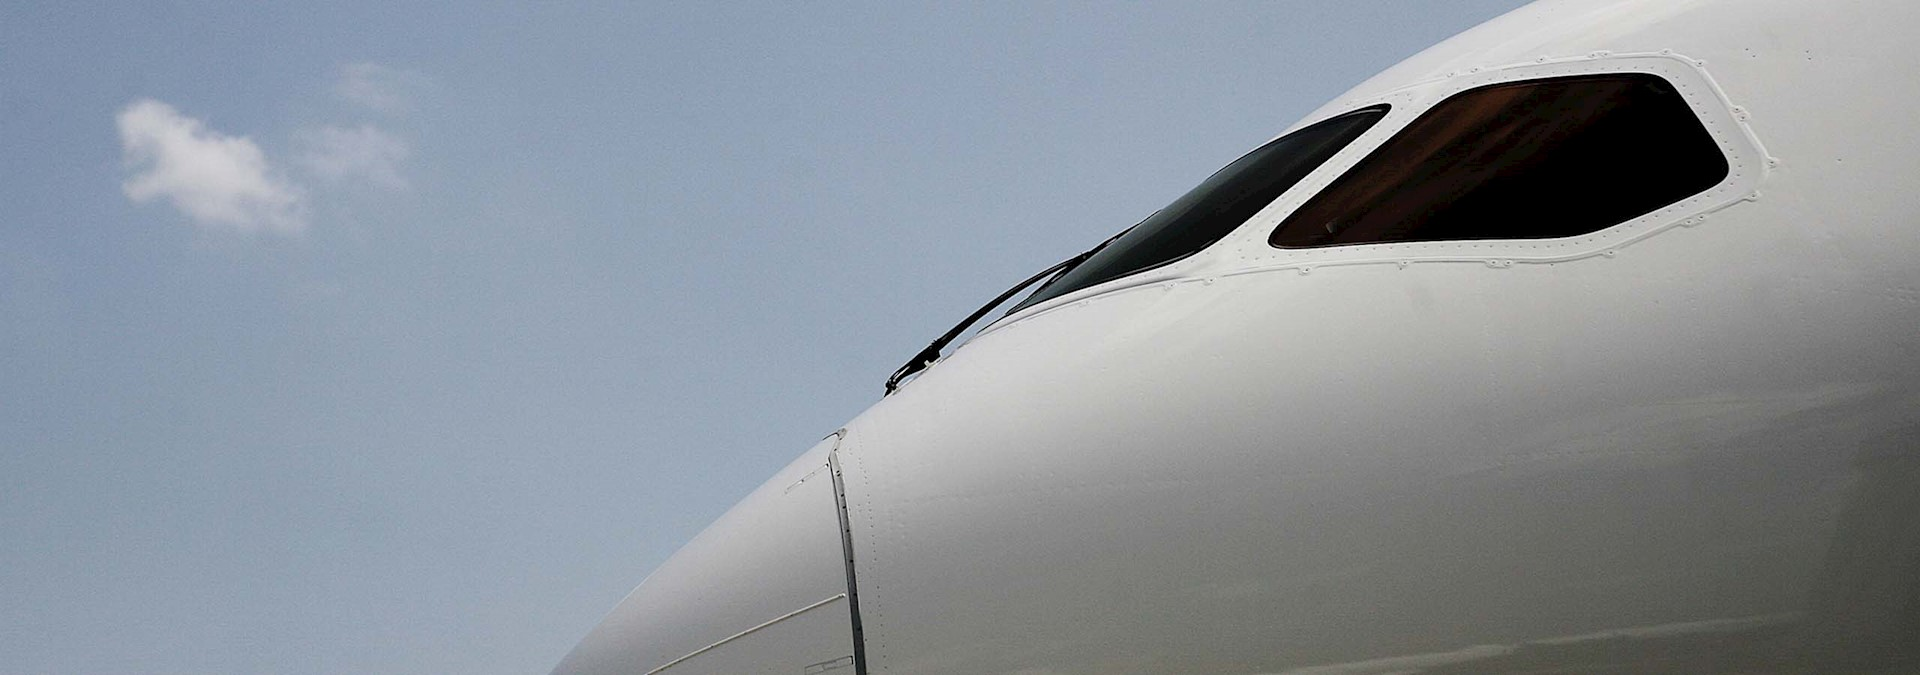 Case studies : Aviation: Benefits Beyond Borders